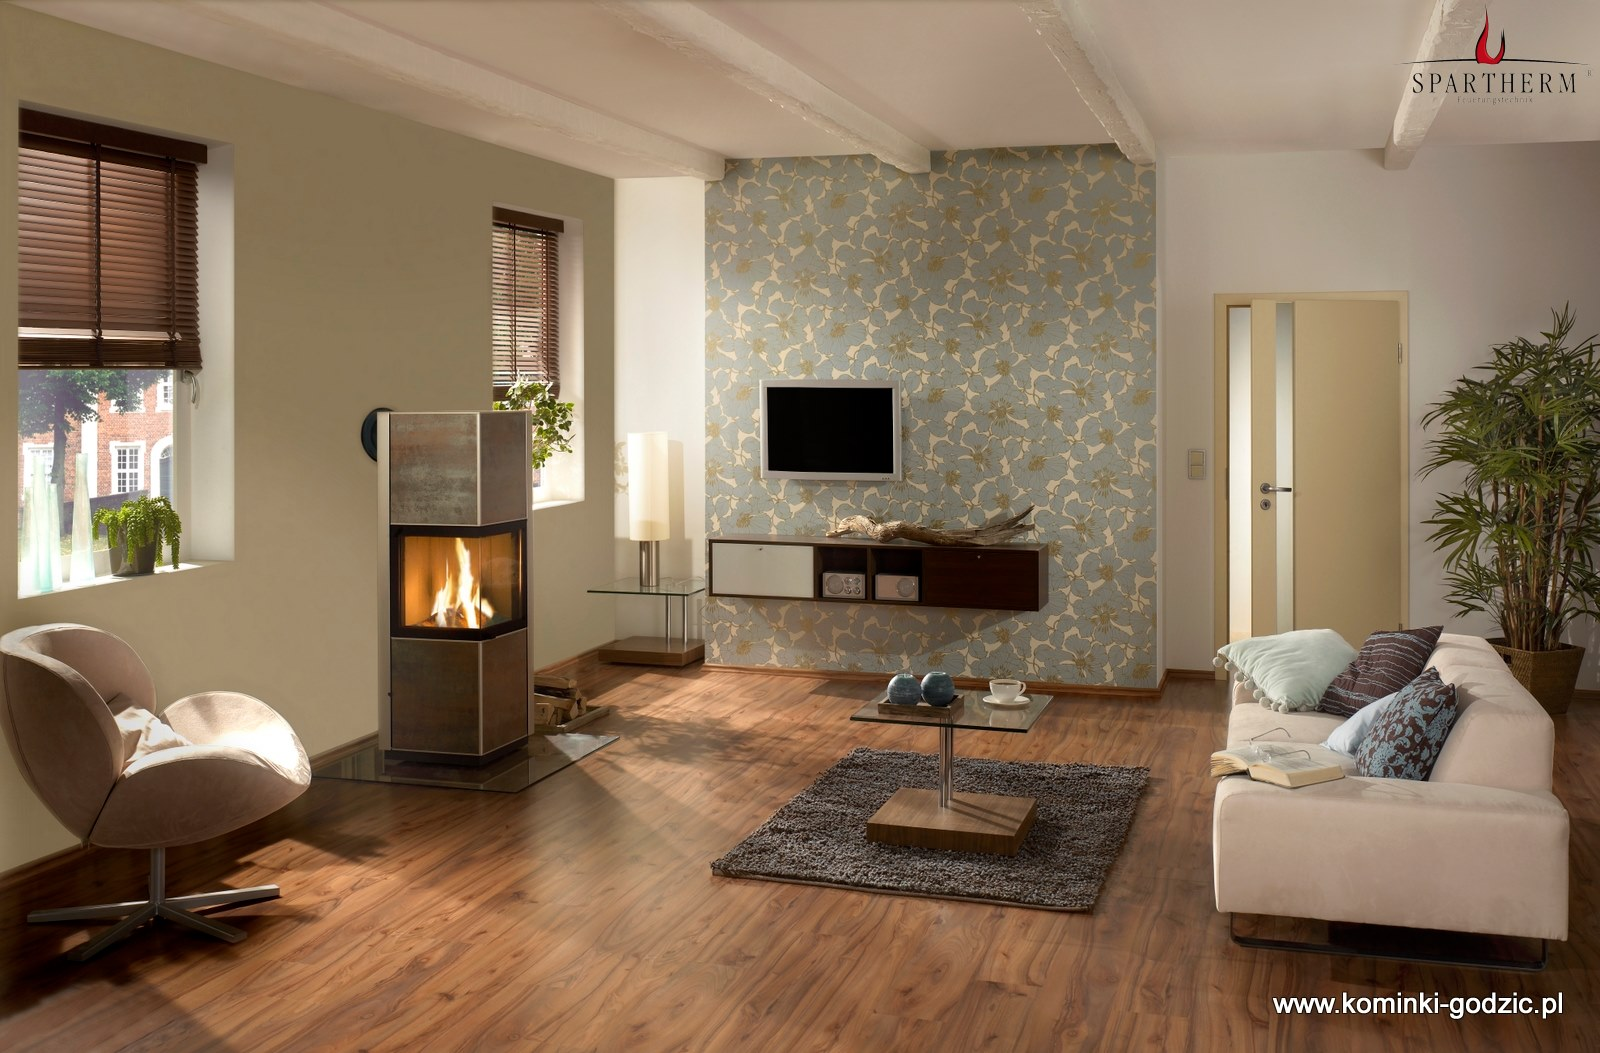 piecyki kominkowe spartherm galeria kominki. Black Bedroom Furniture Sets. Home Design Ideas